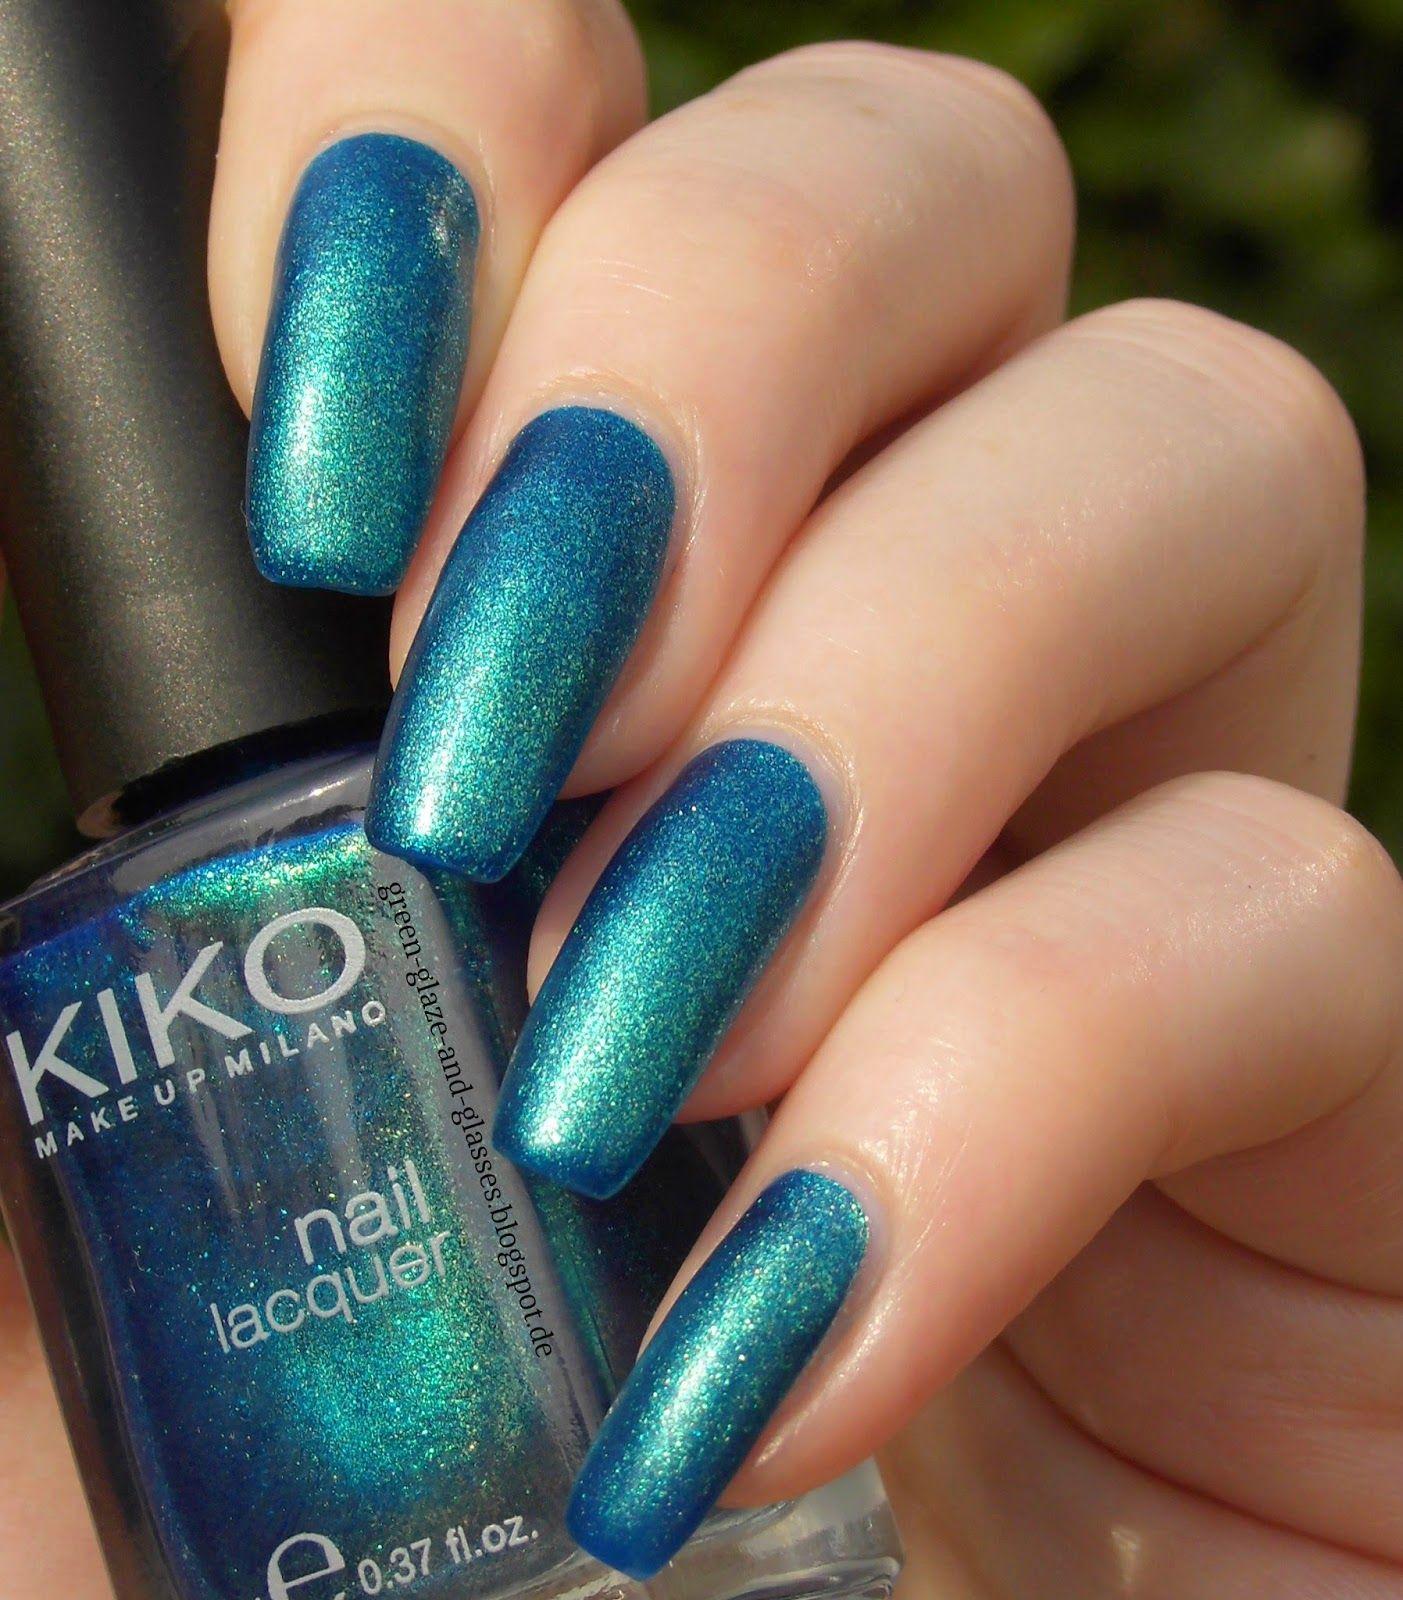 Green, Glaze & Glasses: Kiko 530 Pearly Blue Peacock + Manhattan Pro Mat